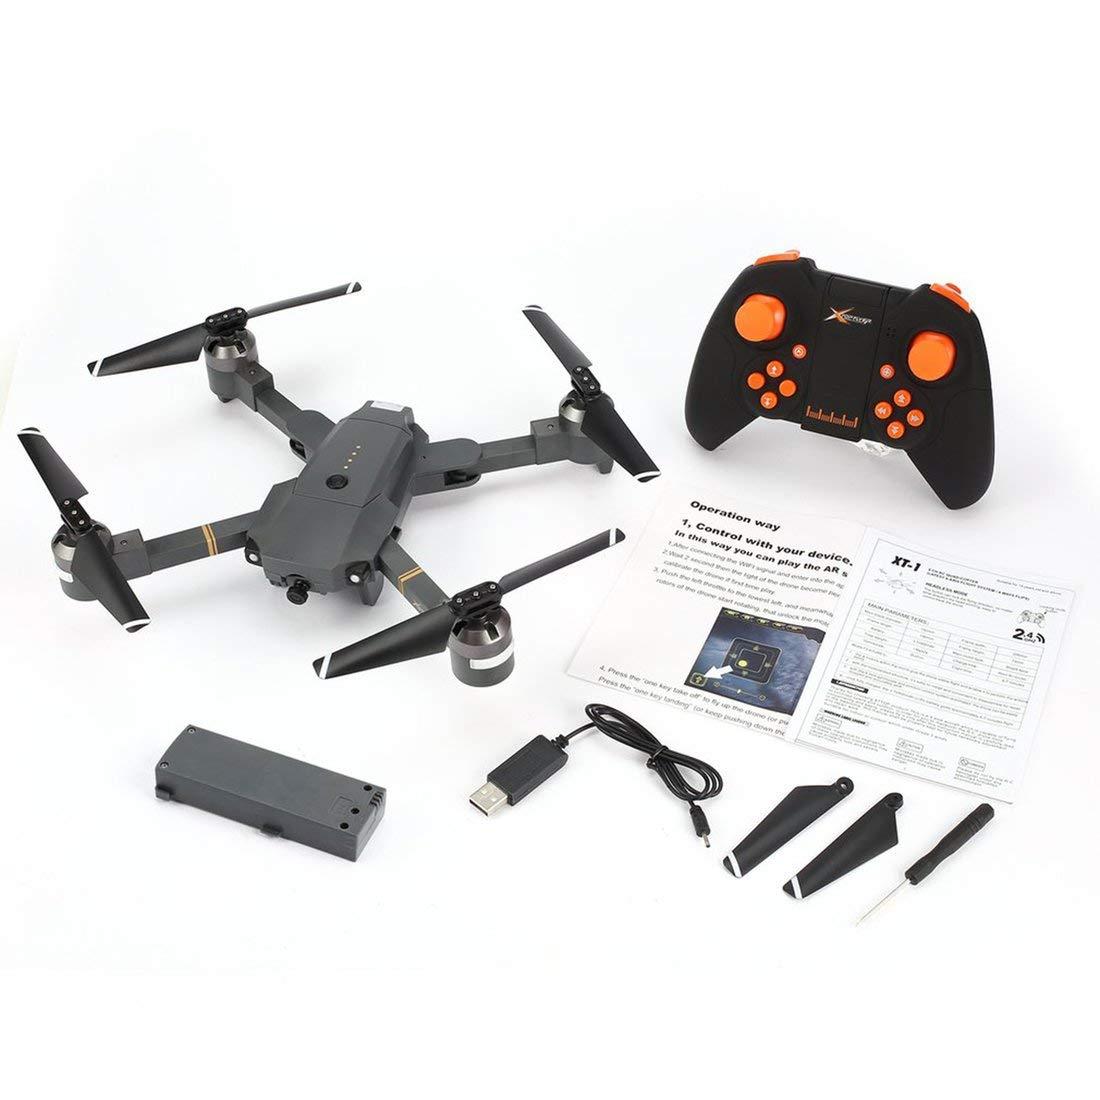 Formulaone Attop XT-1 2,4 GHz 6-Achsen-Gyro Faltbare Drohne Wi-Fi 2MP HD Kamera FPV RC Quadcopter mit Headless-Modus Höhe halten 3D Flips